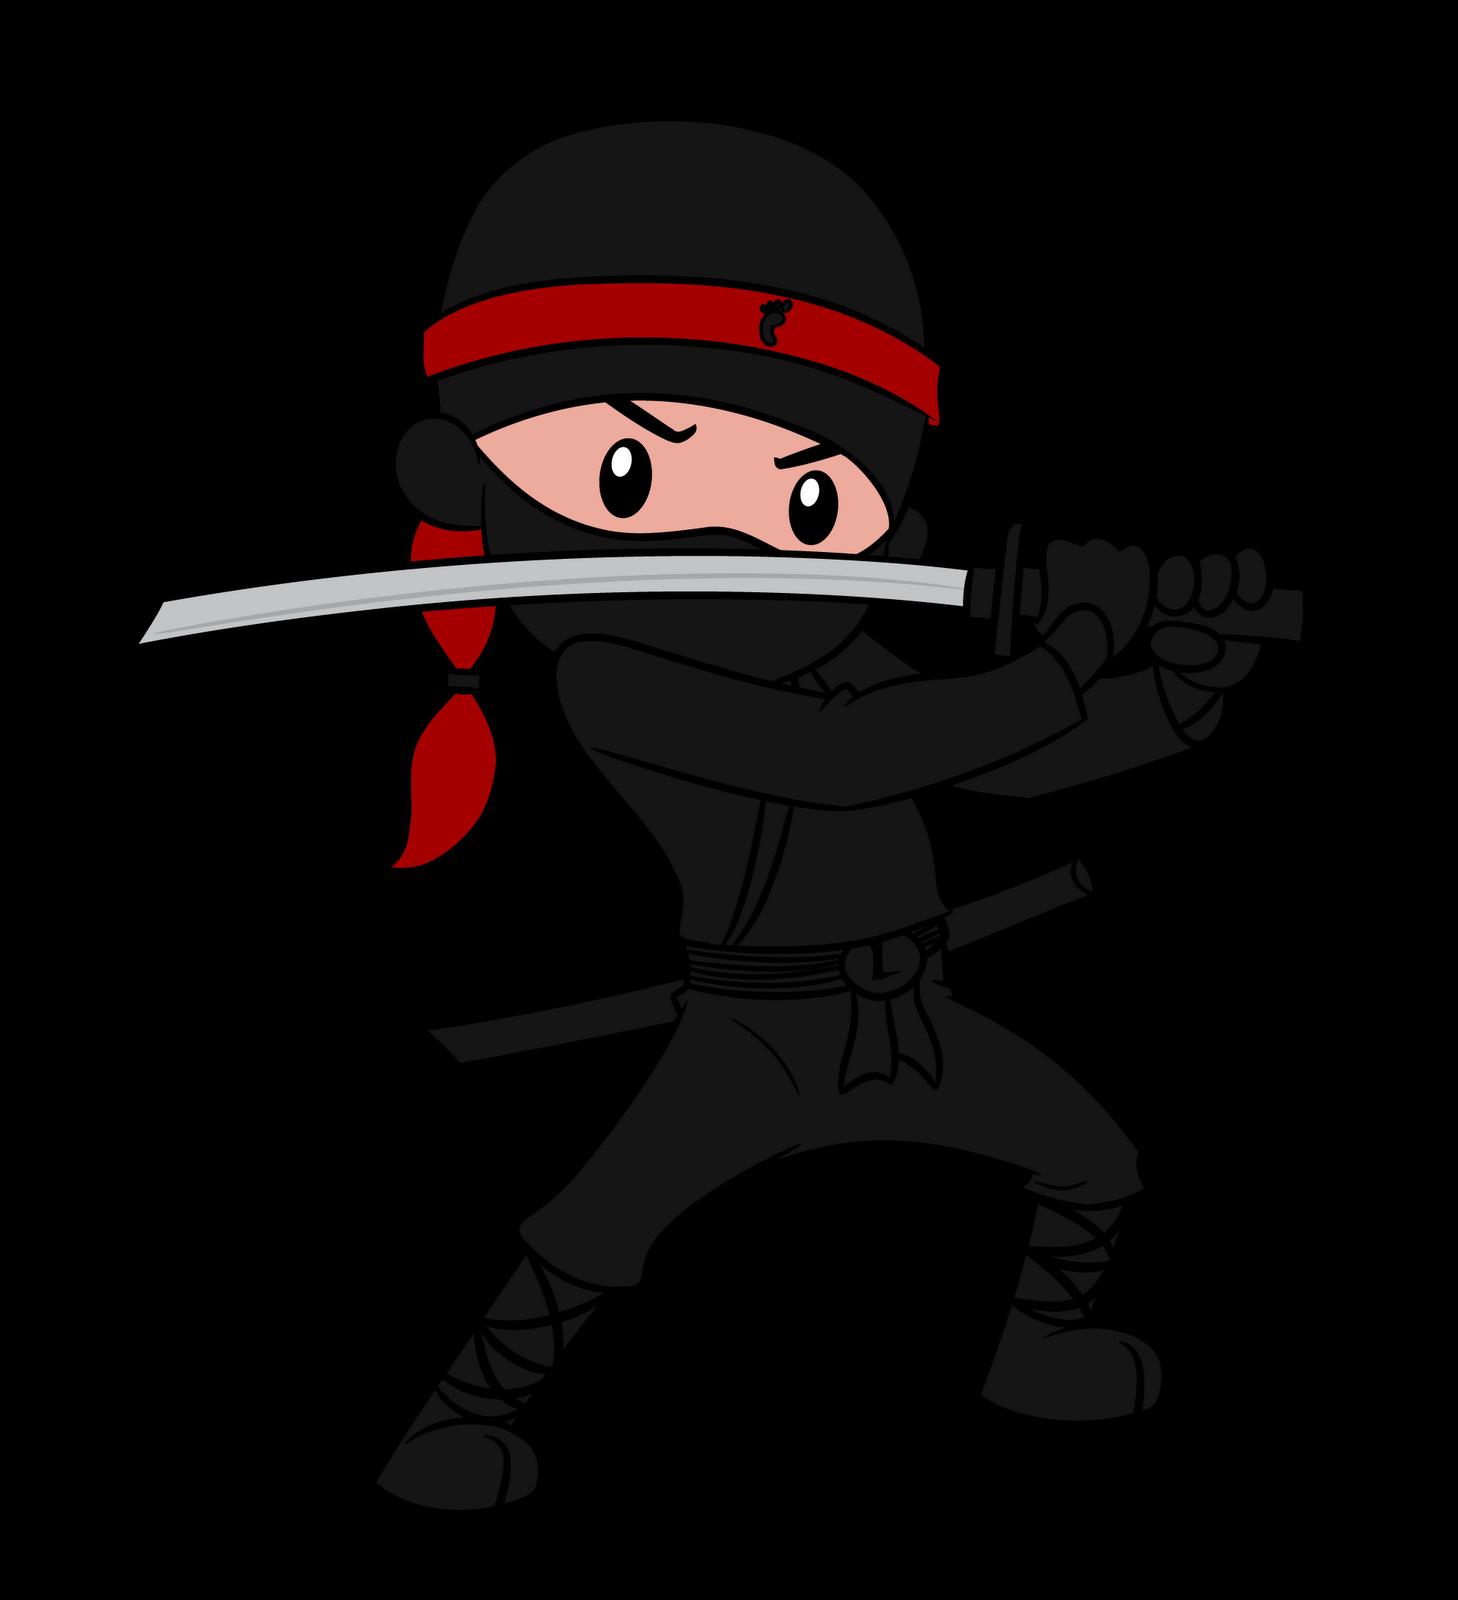 image lucy ninja png ninjago fanon wiki fandom skateboard clip art birthday party skateboarding clip art